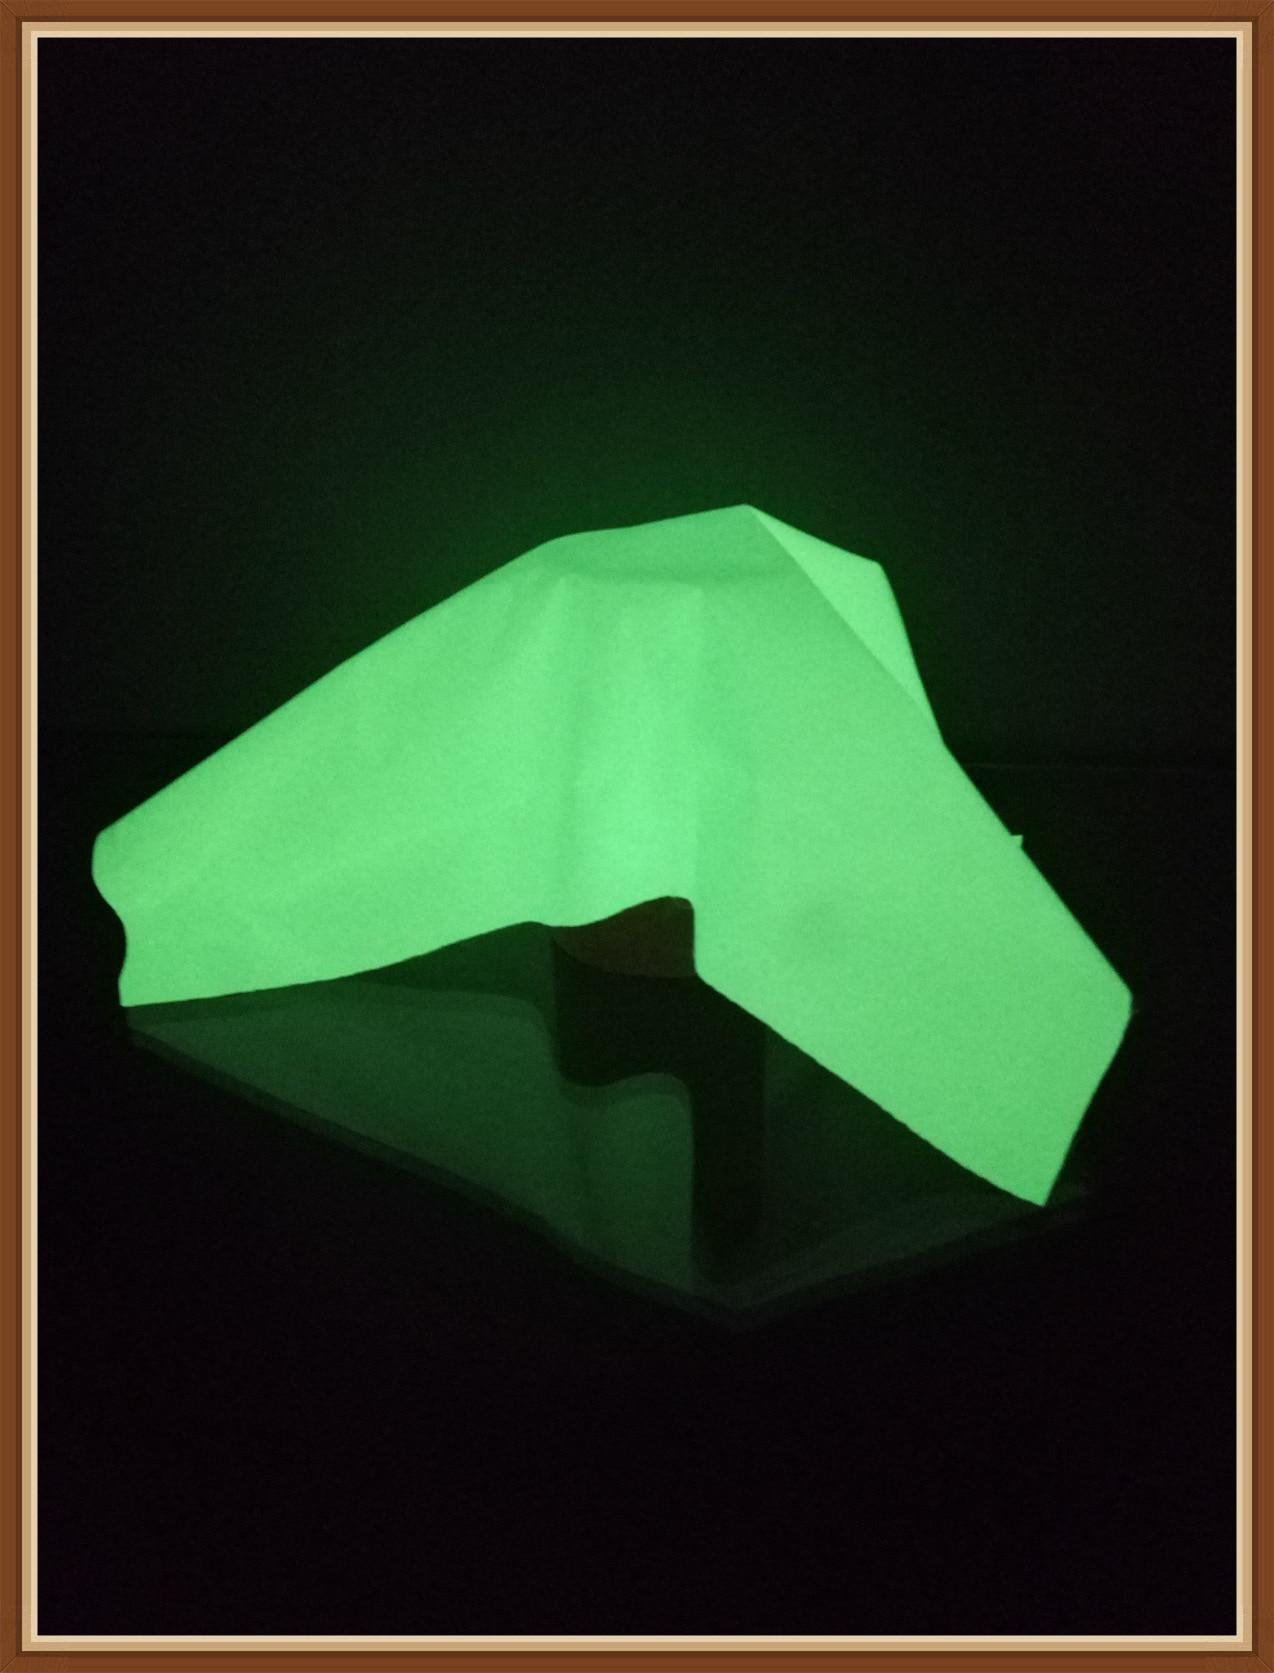 Supply Night Light Self-Shining Cloth, Shining Wan Ju Bu Night Light Reflective Chemical Fiber Cloth Blue Luminous Fabric